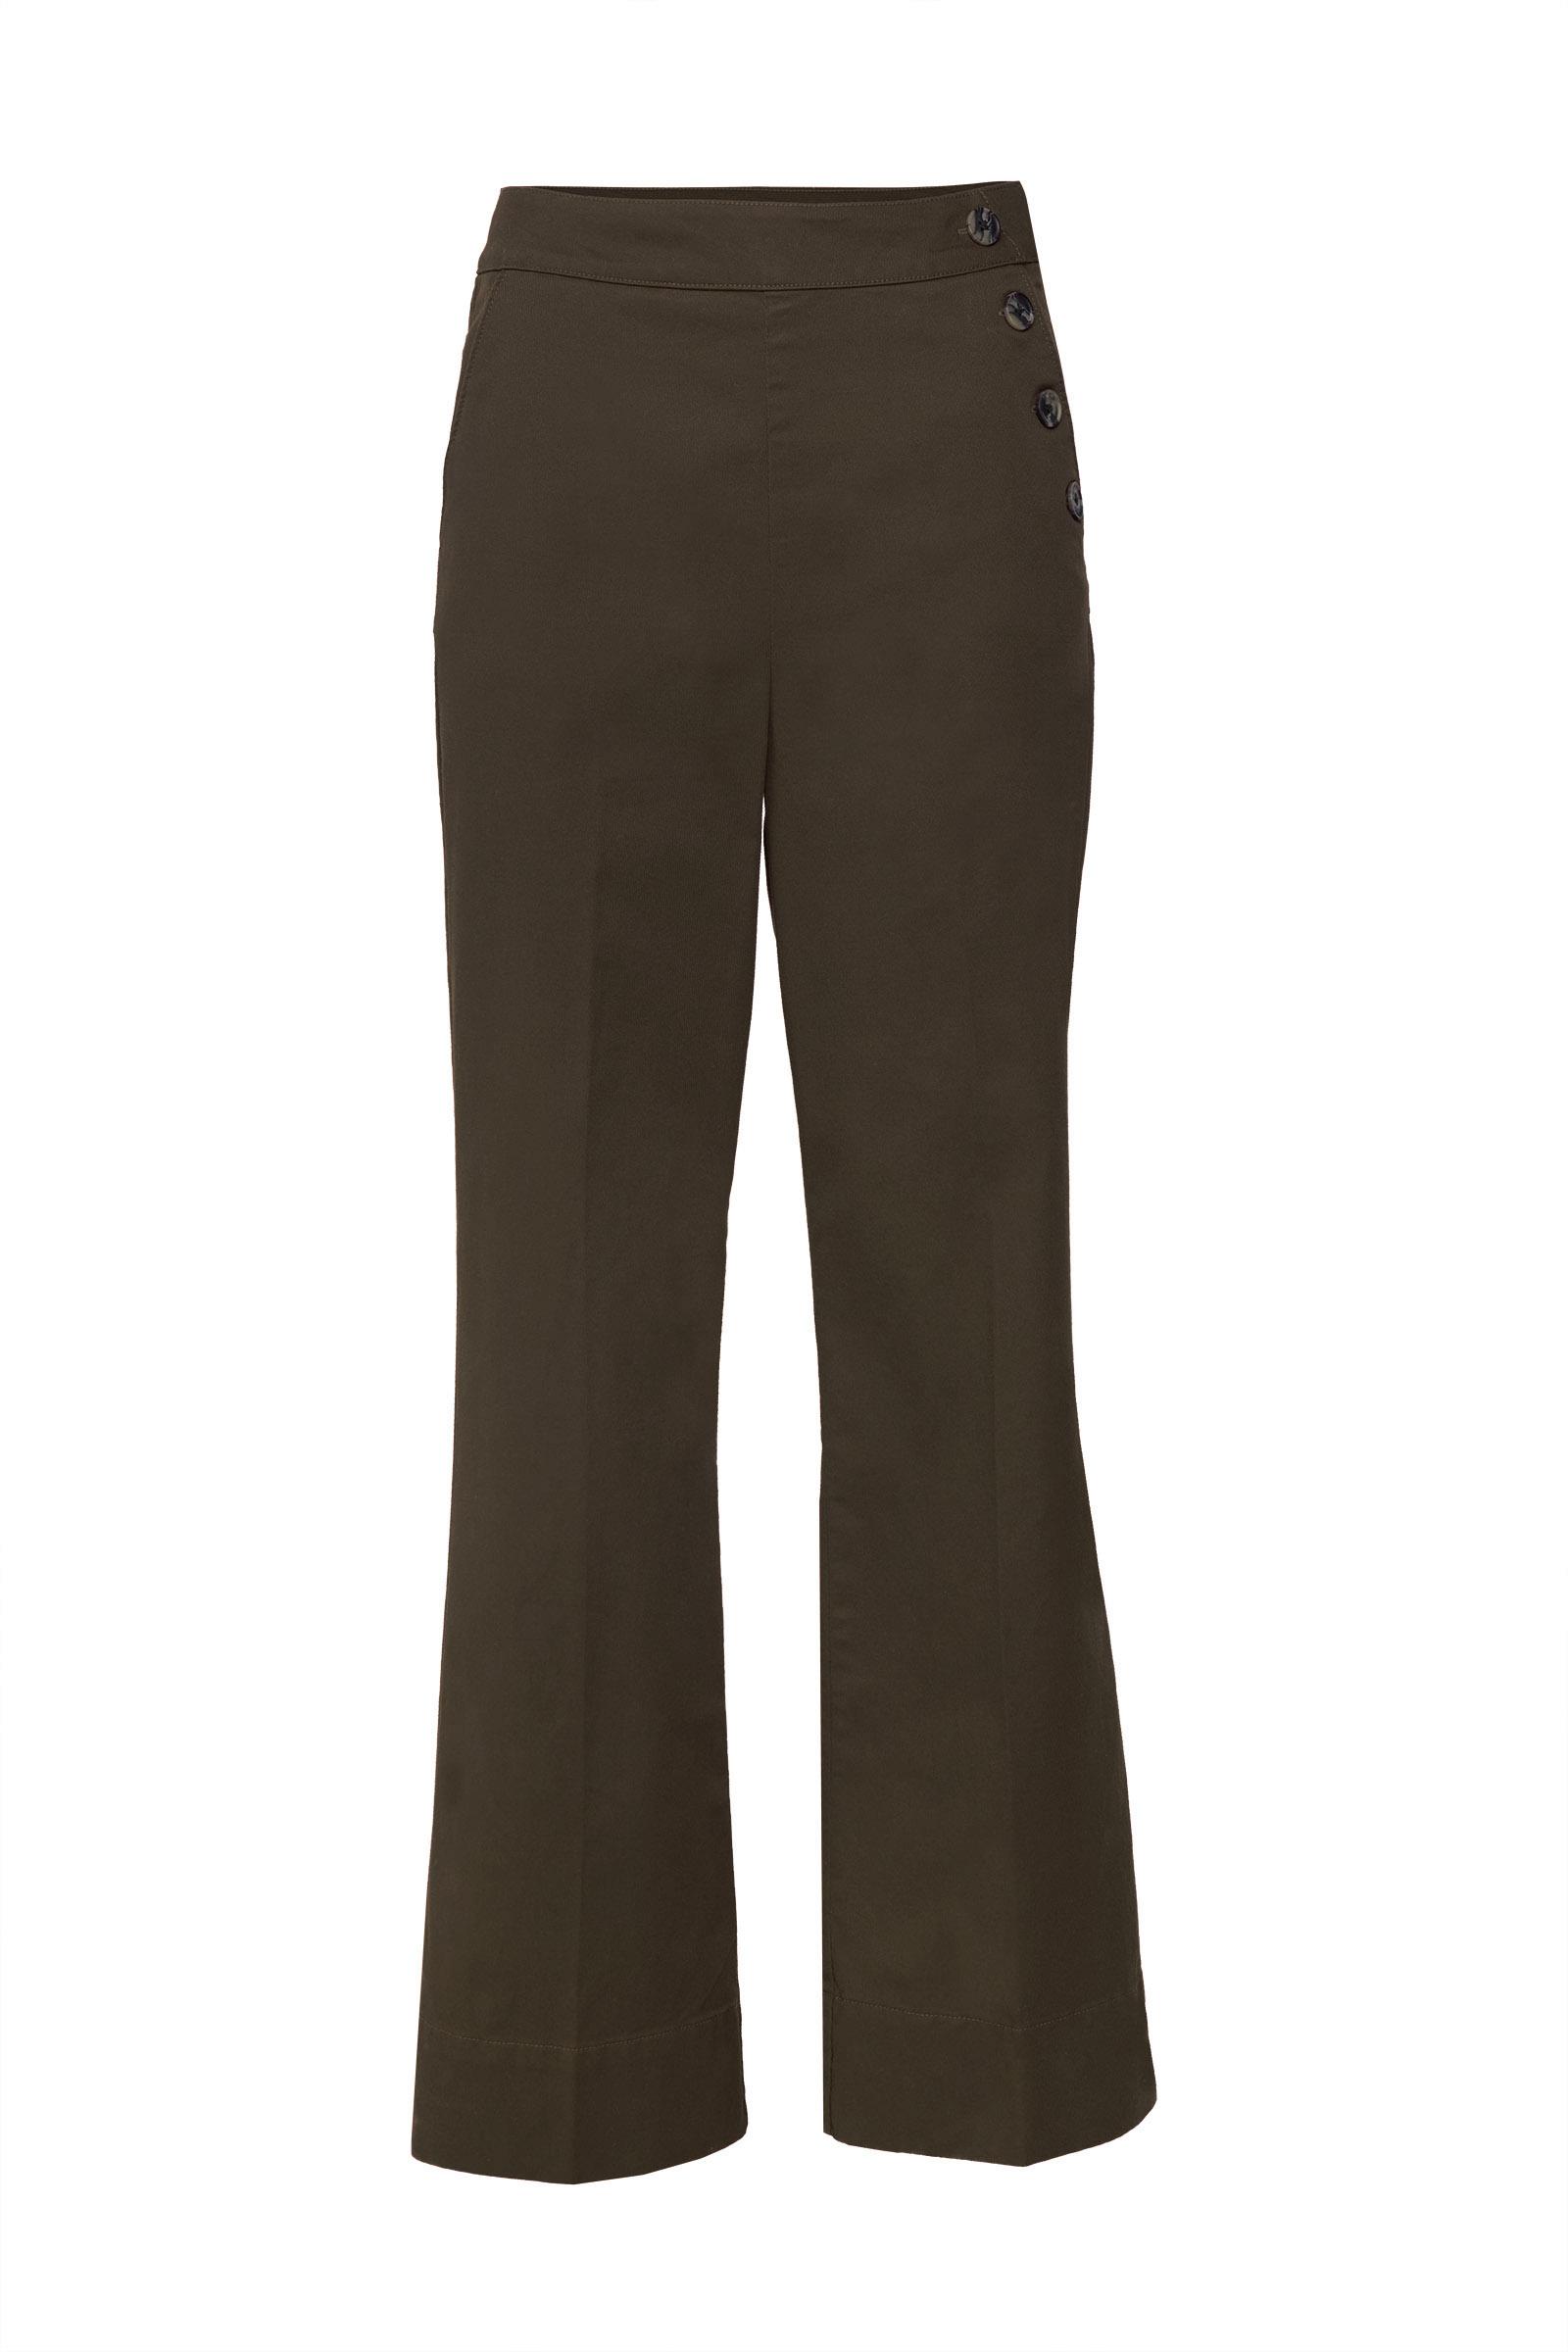 Dames broek met knoopdetail | 95274638 WE Fashion